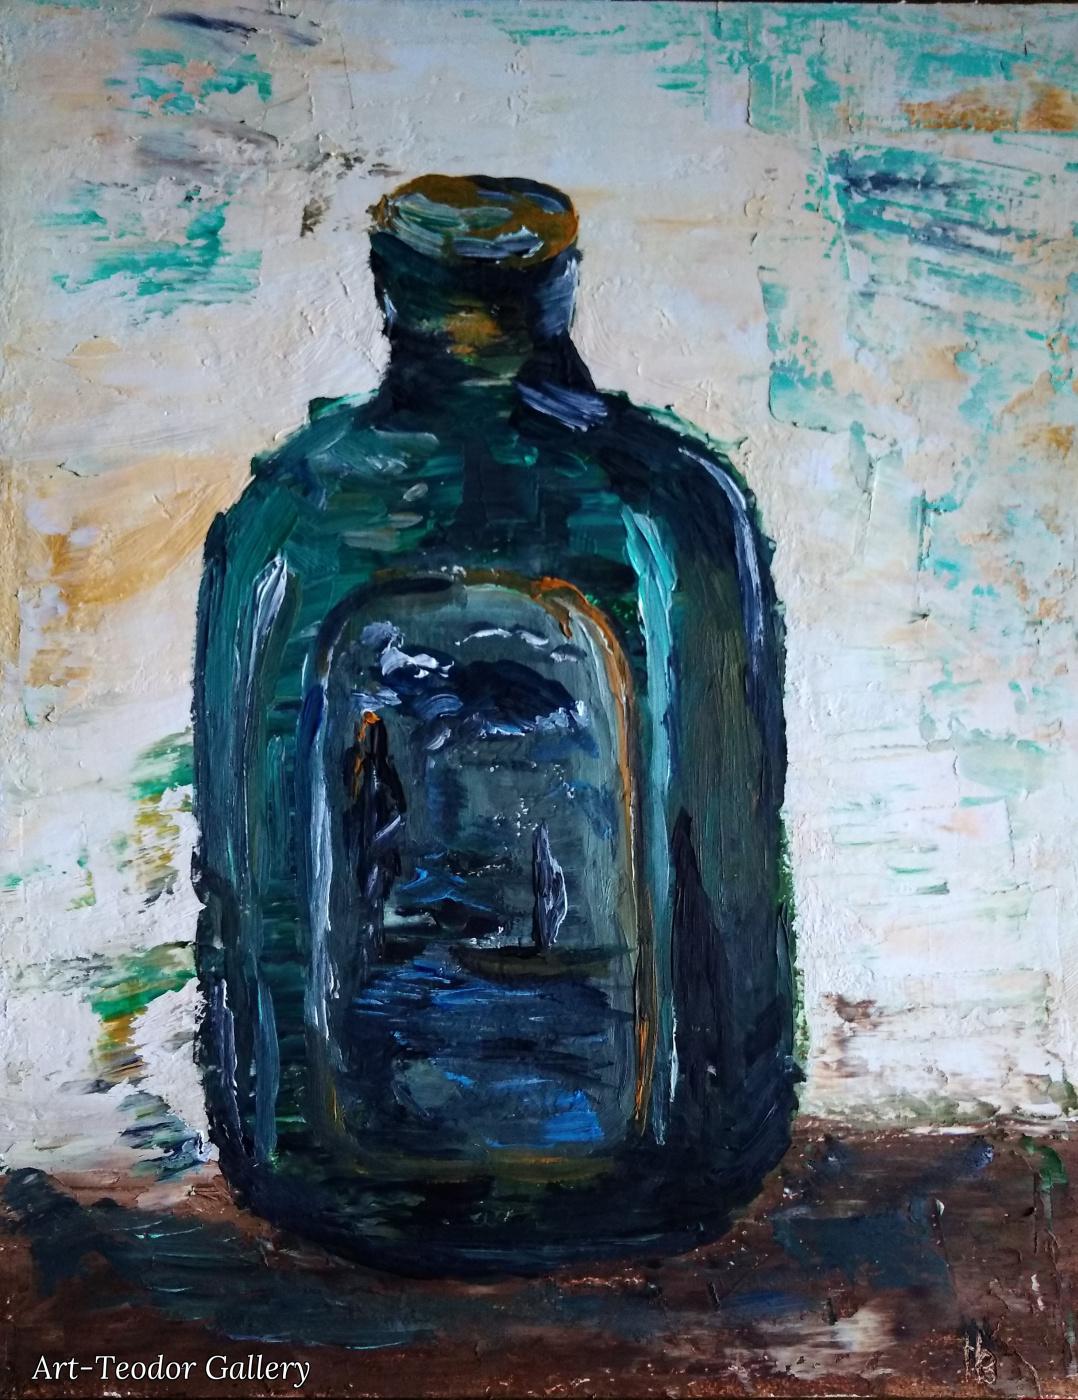 Art-Teodor Gallery. Бутылка